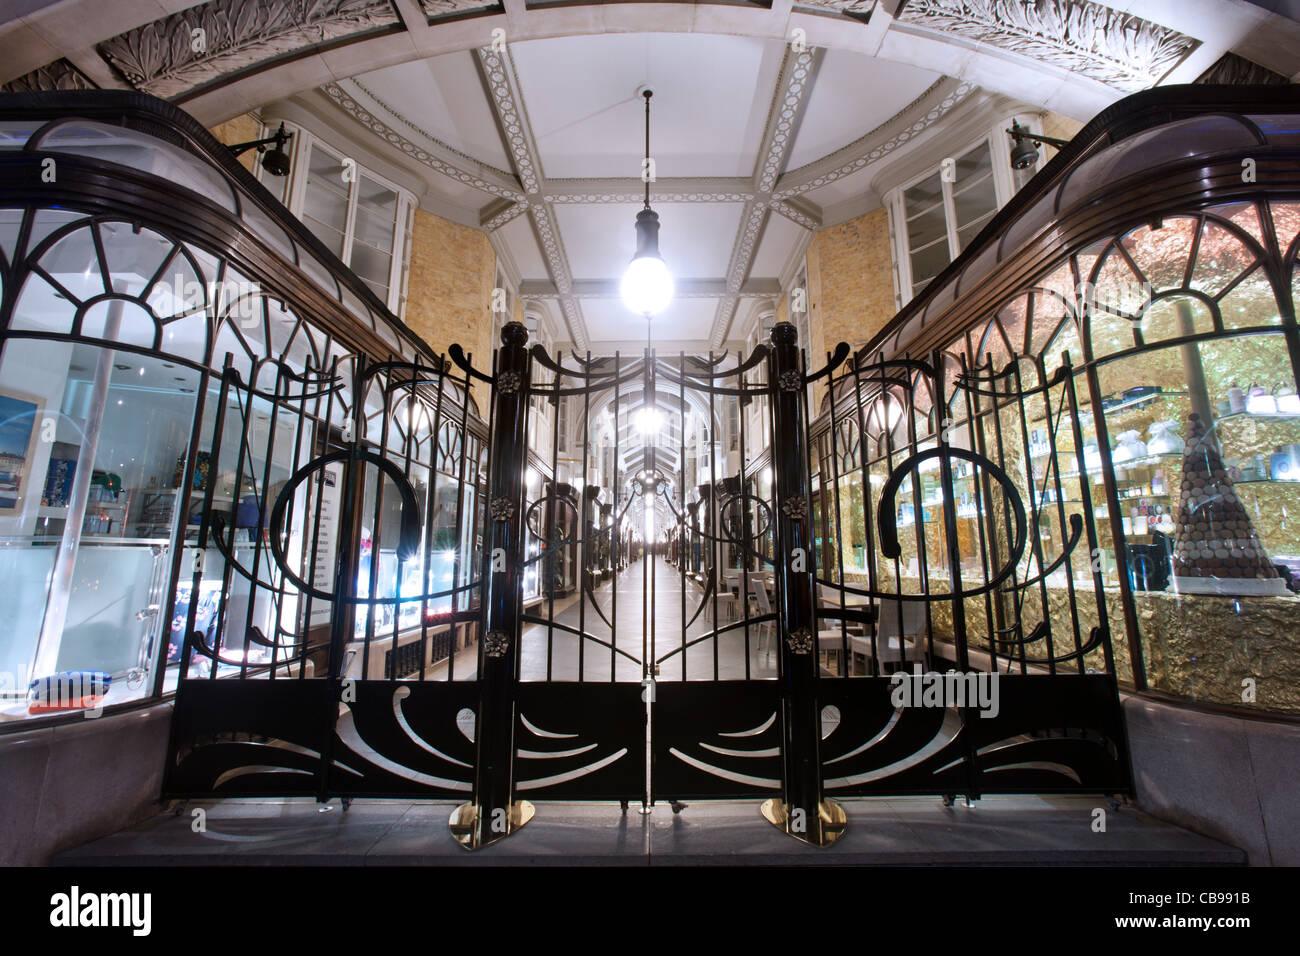 The Burlington Arcade, London, UK Stock Photo